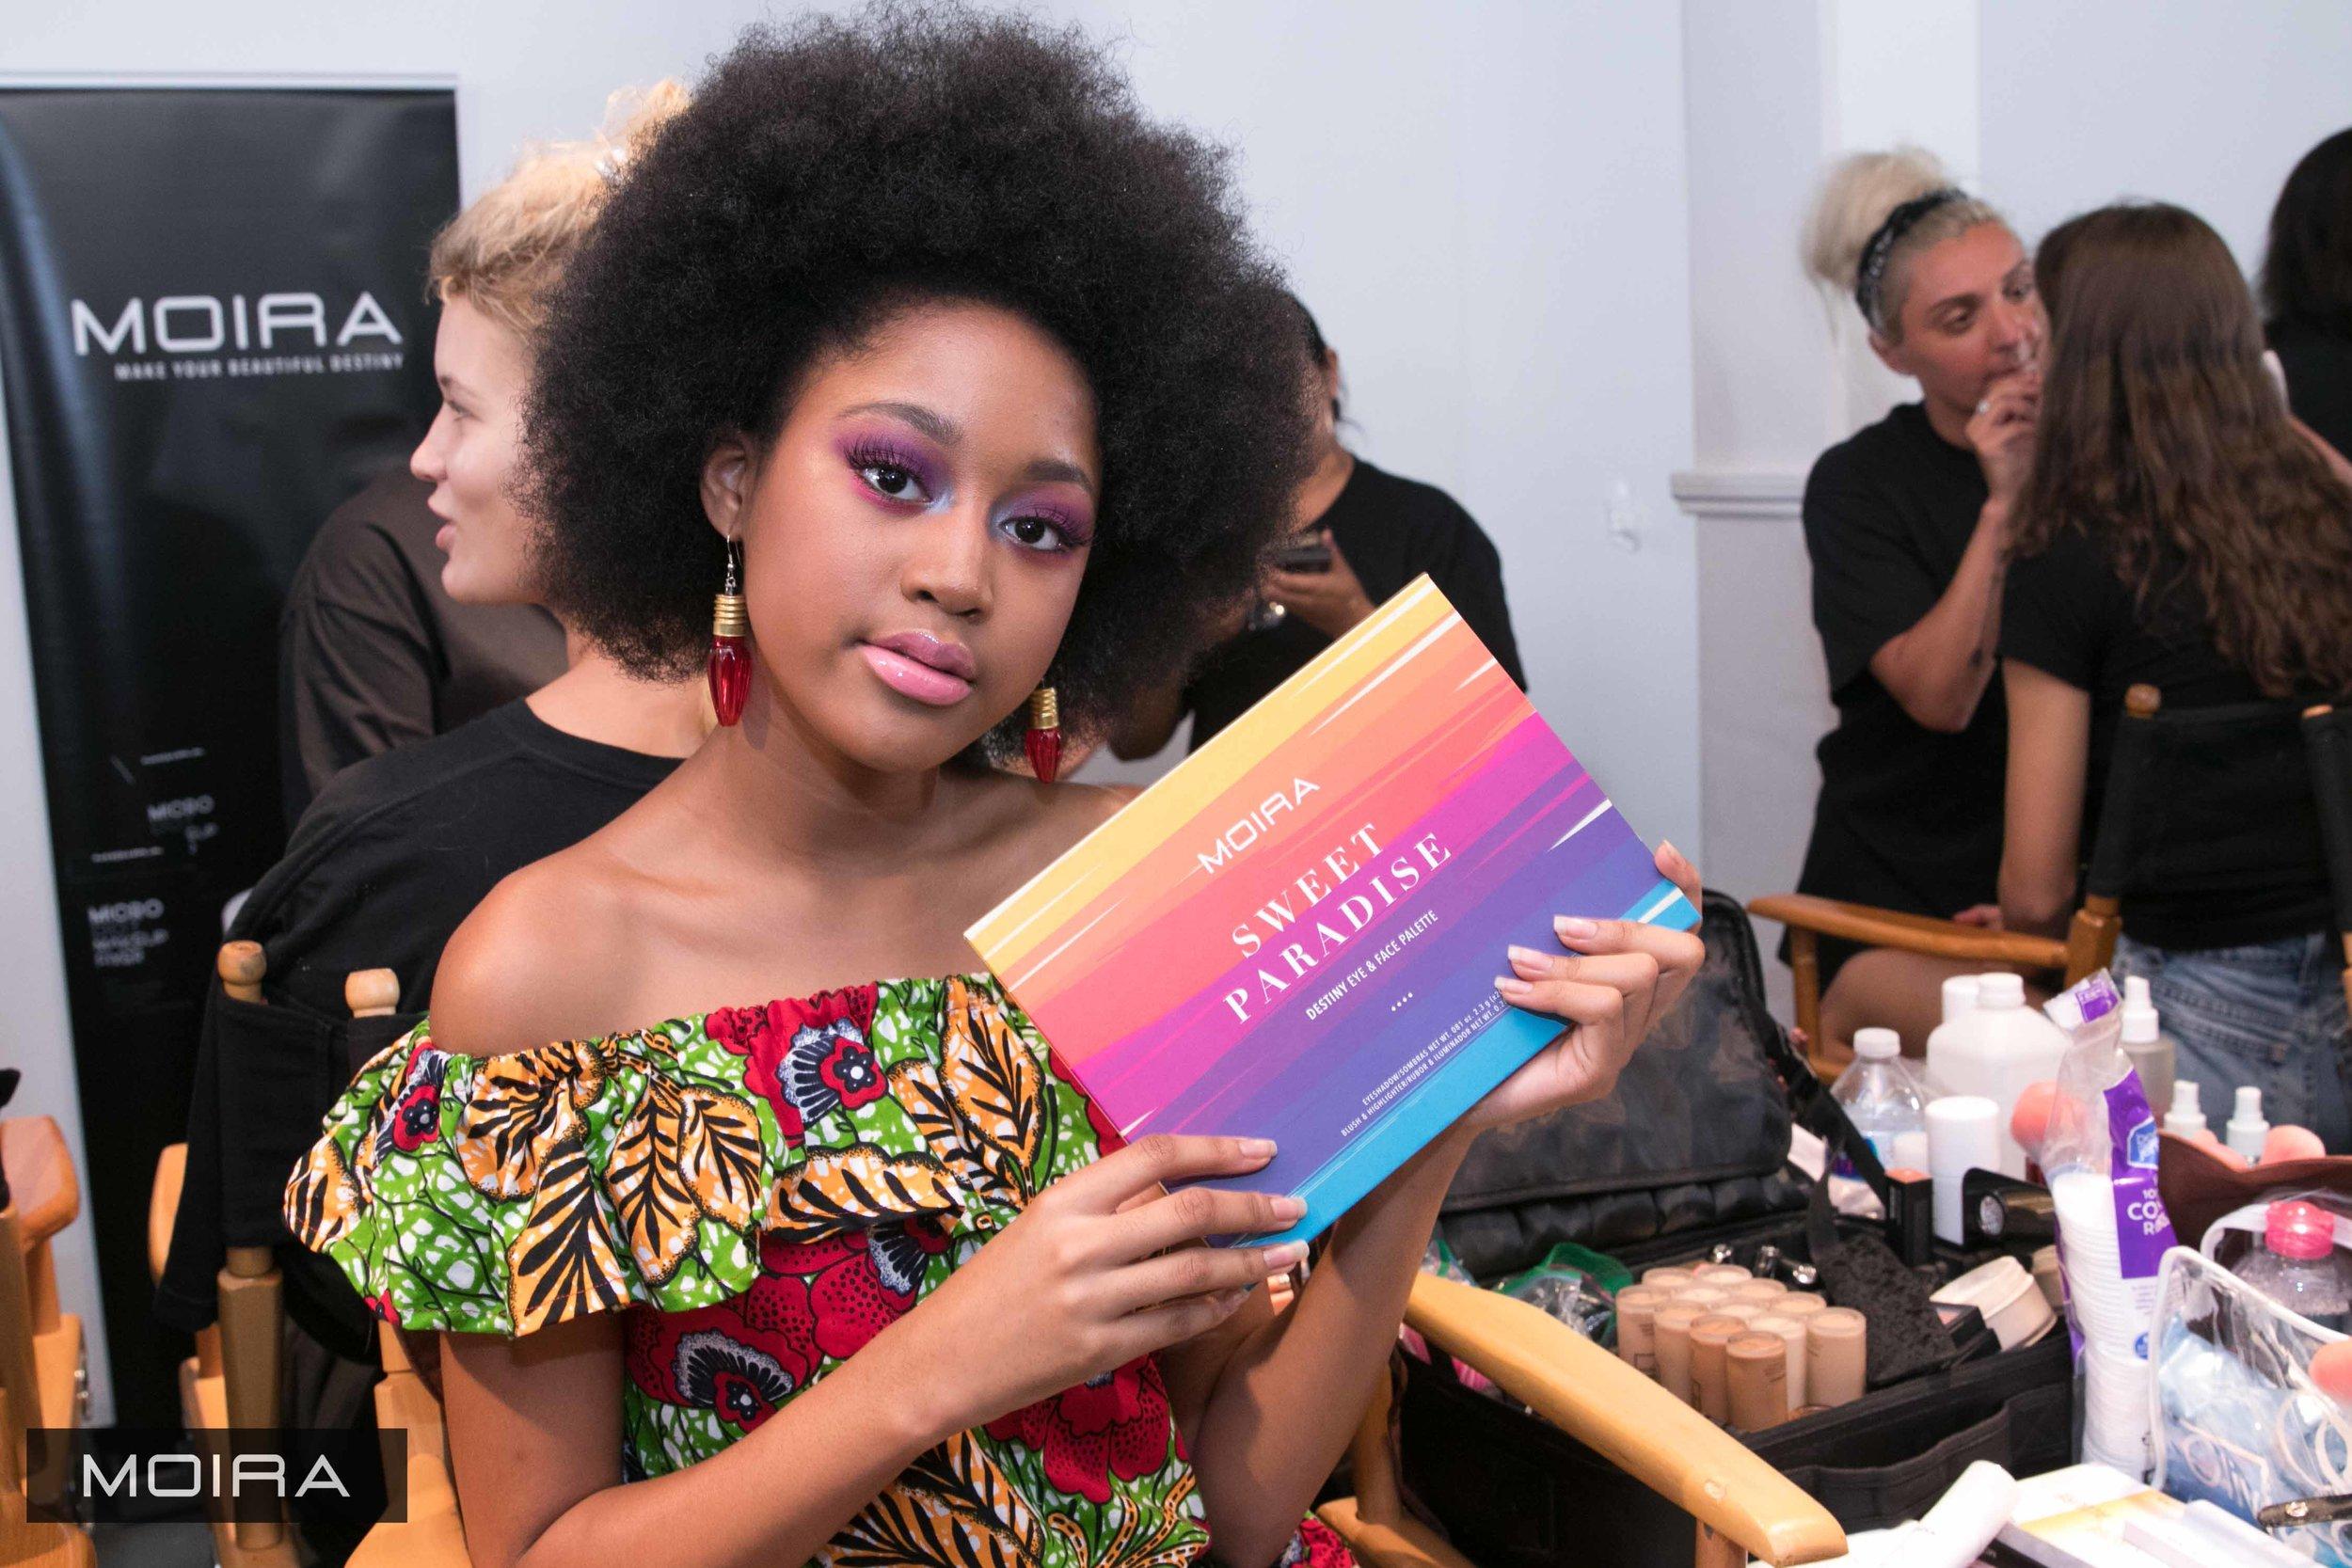 MOIRA_Cosmetics_New_York_Fashion_Week_2018-20.jpg